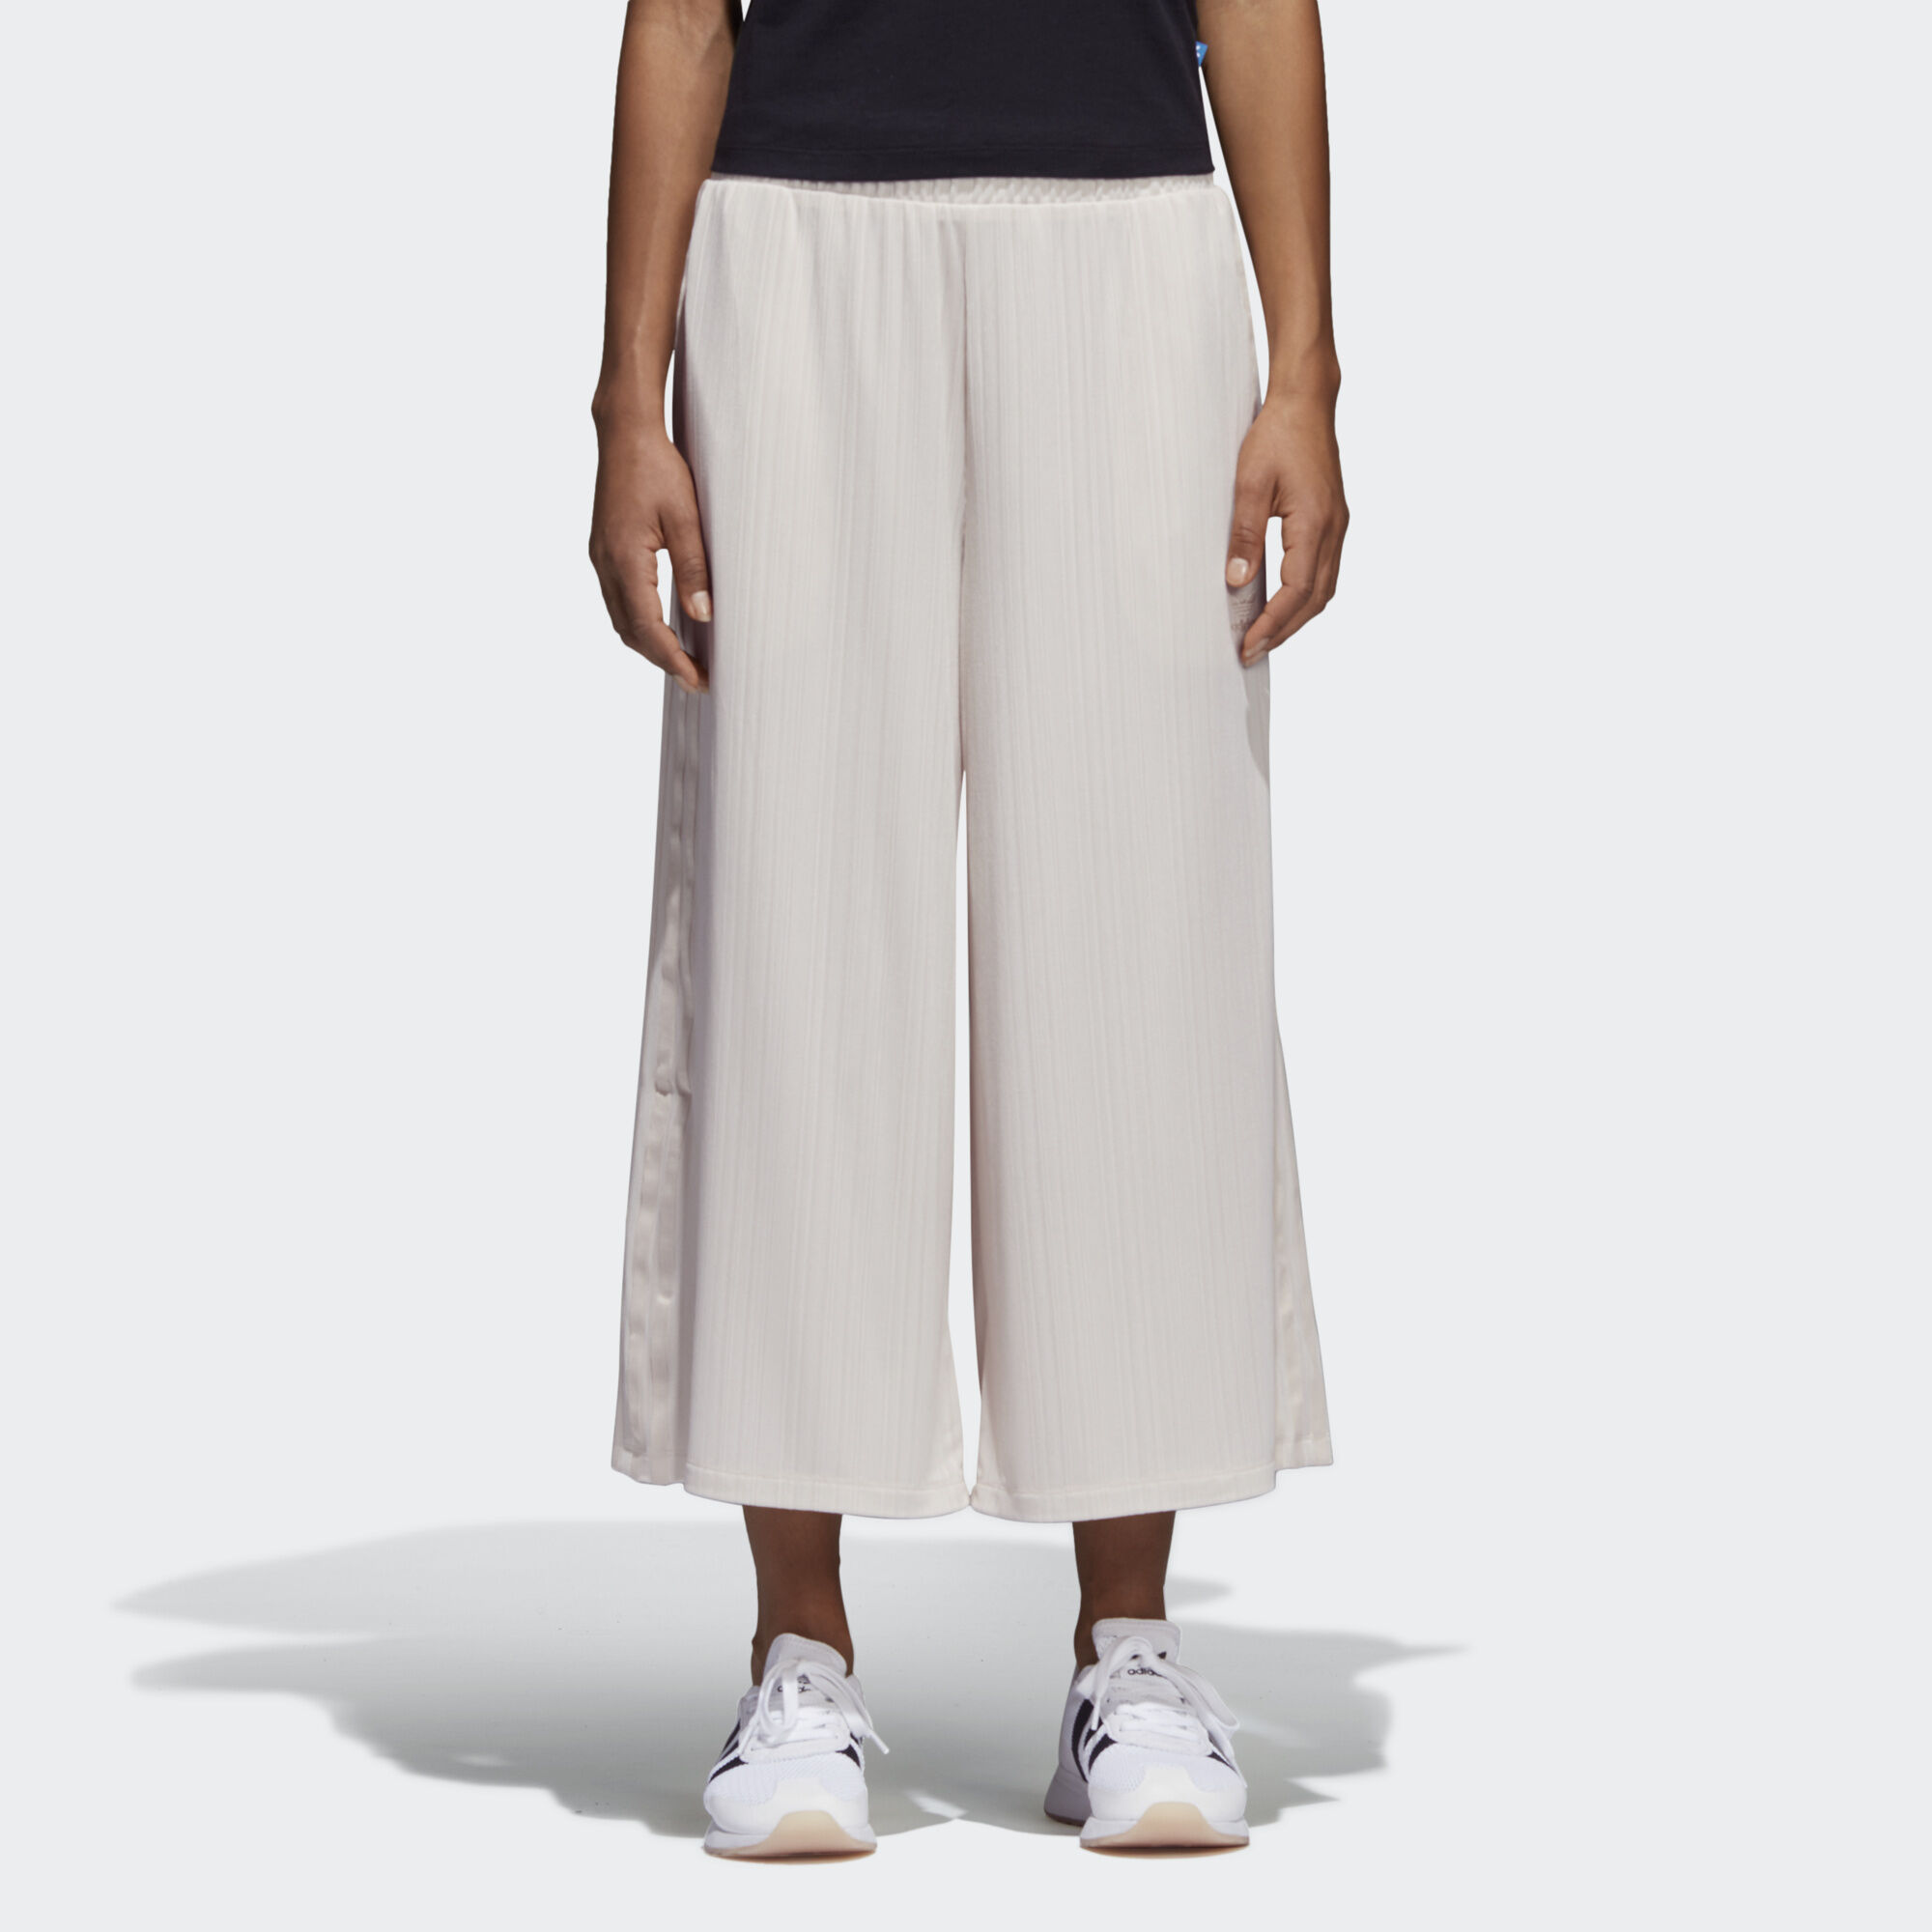 adidas - Styling Complements Ribbed Pants Linen CW0457. Women Originals cc6d4131d5e